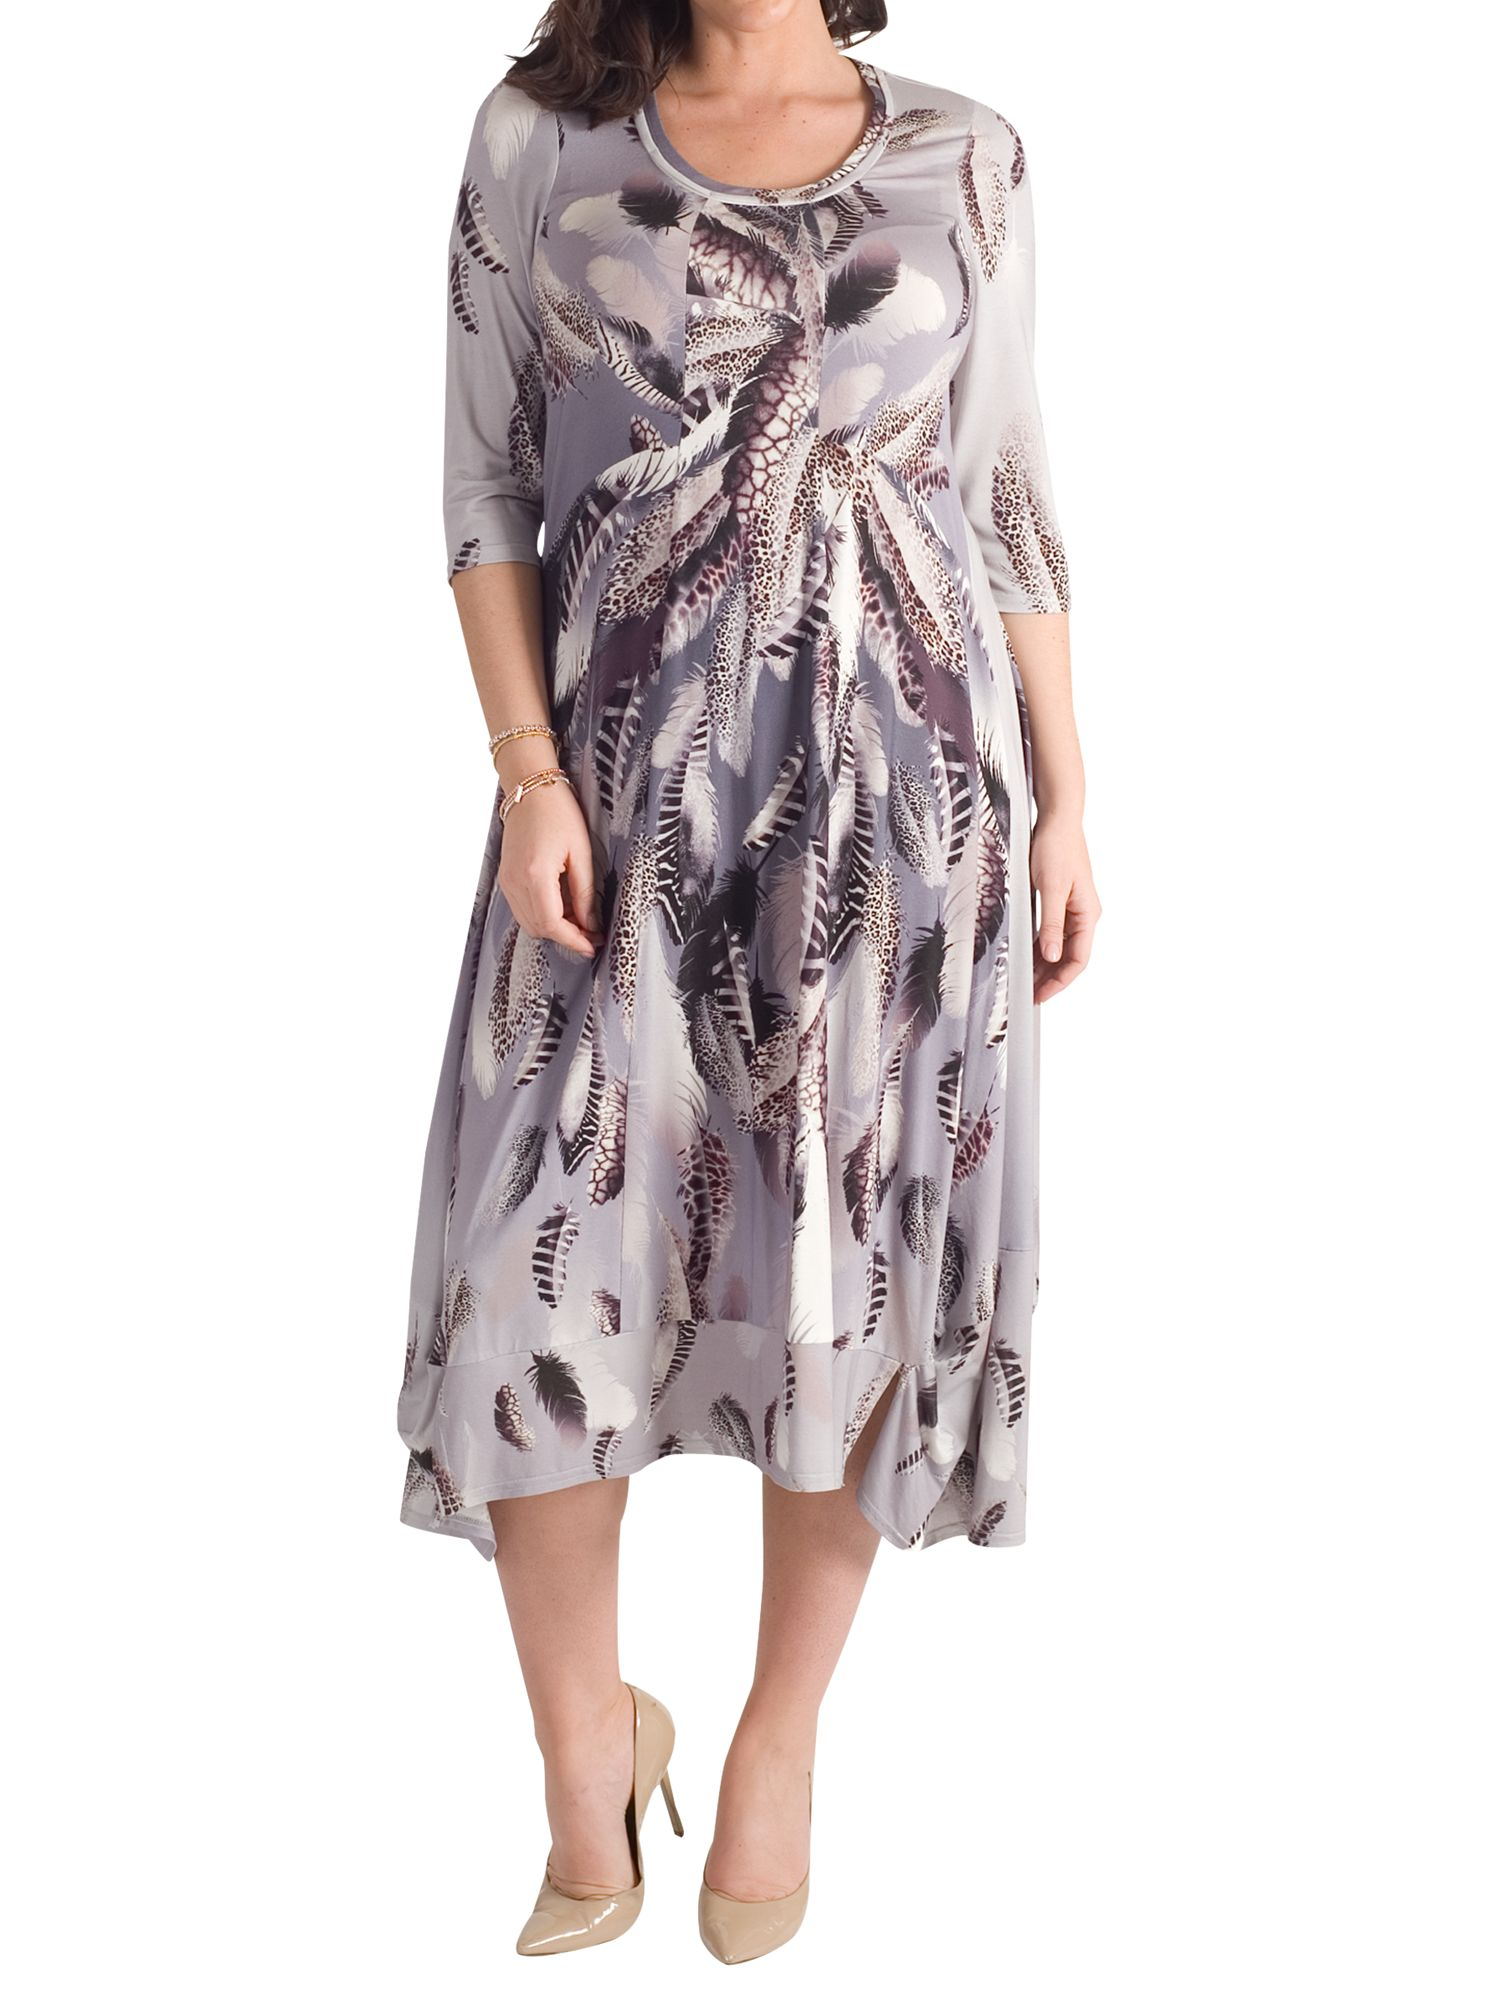 Chesca Chesca Feather Print Dress, Silver Grey